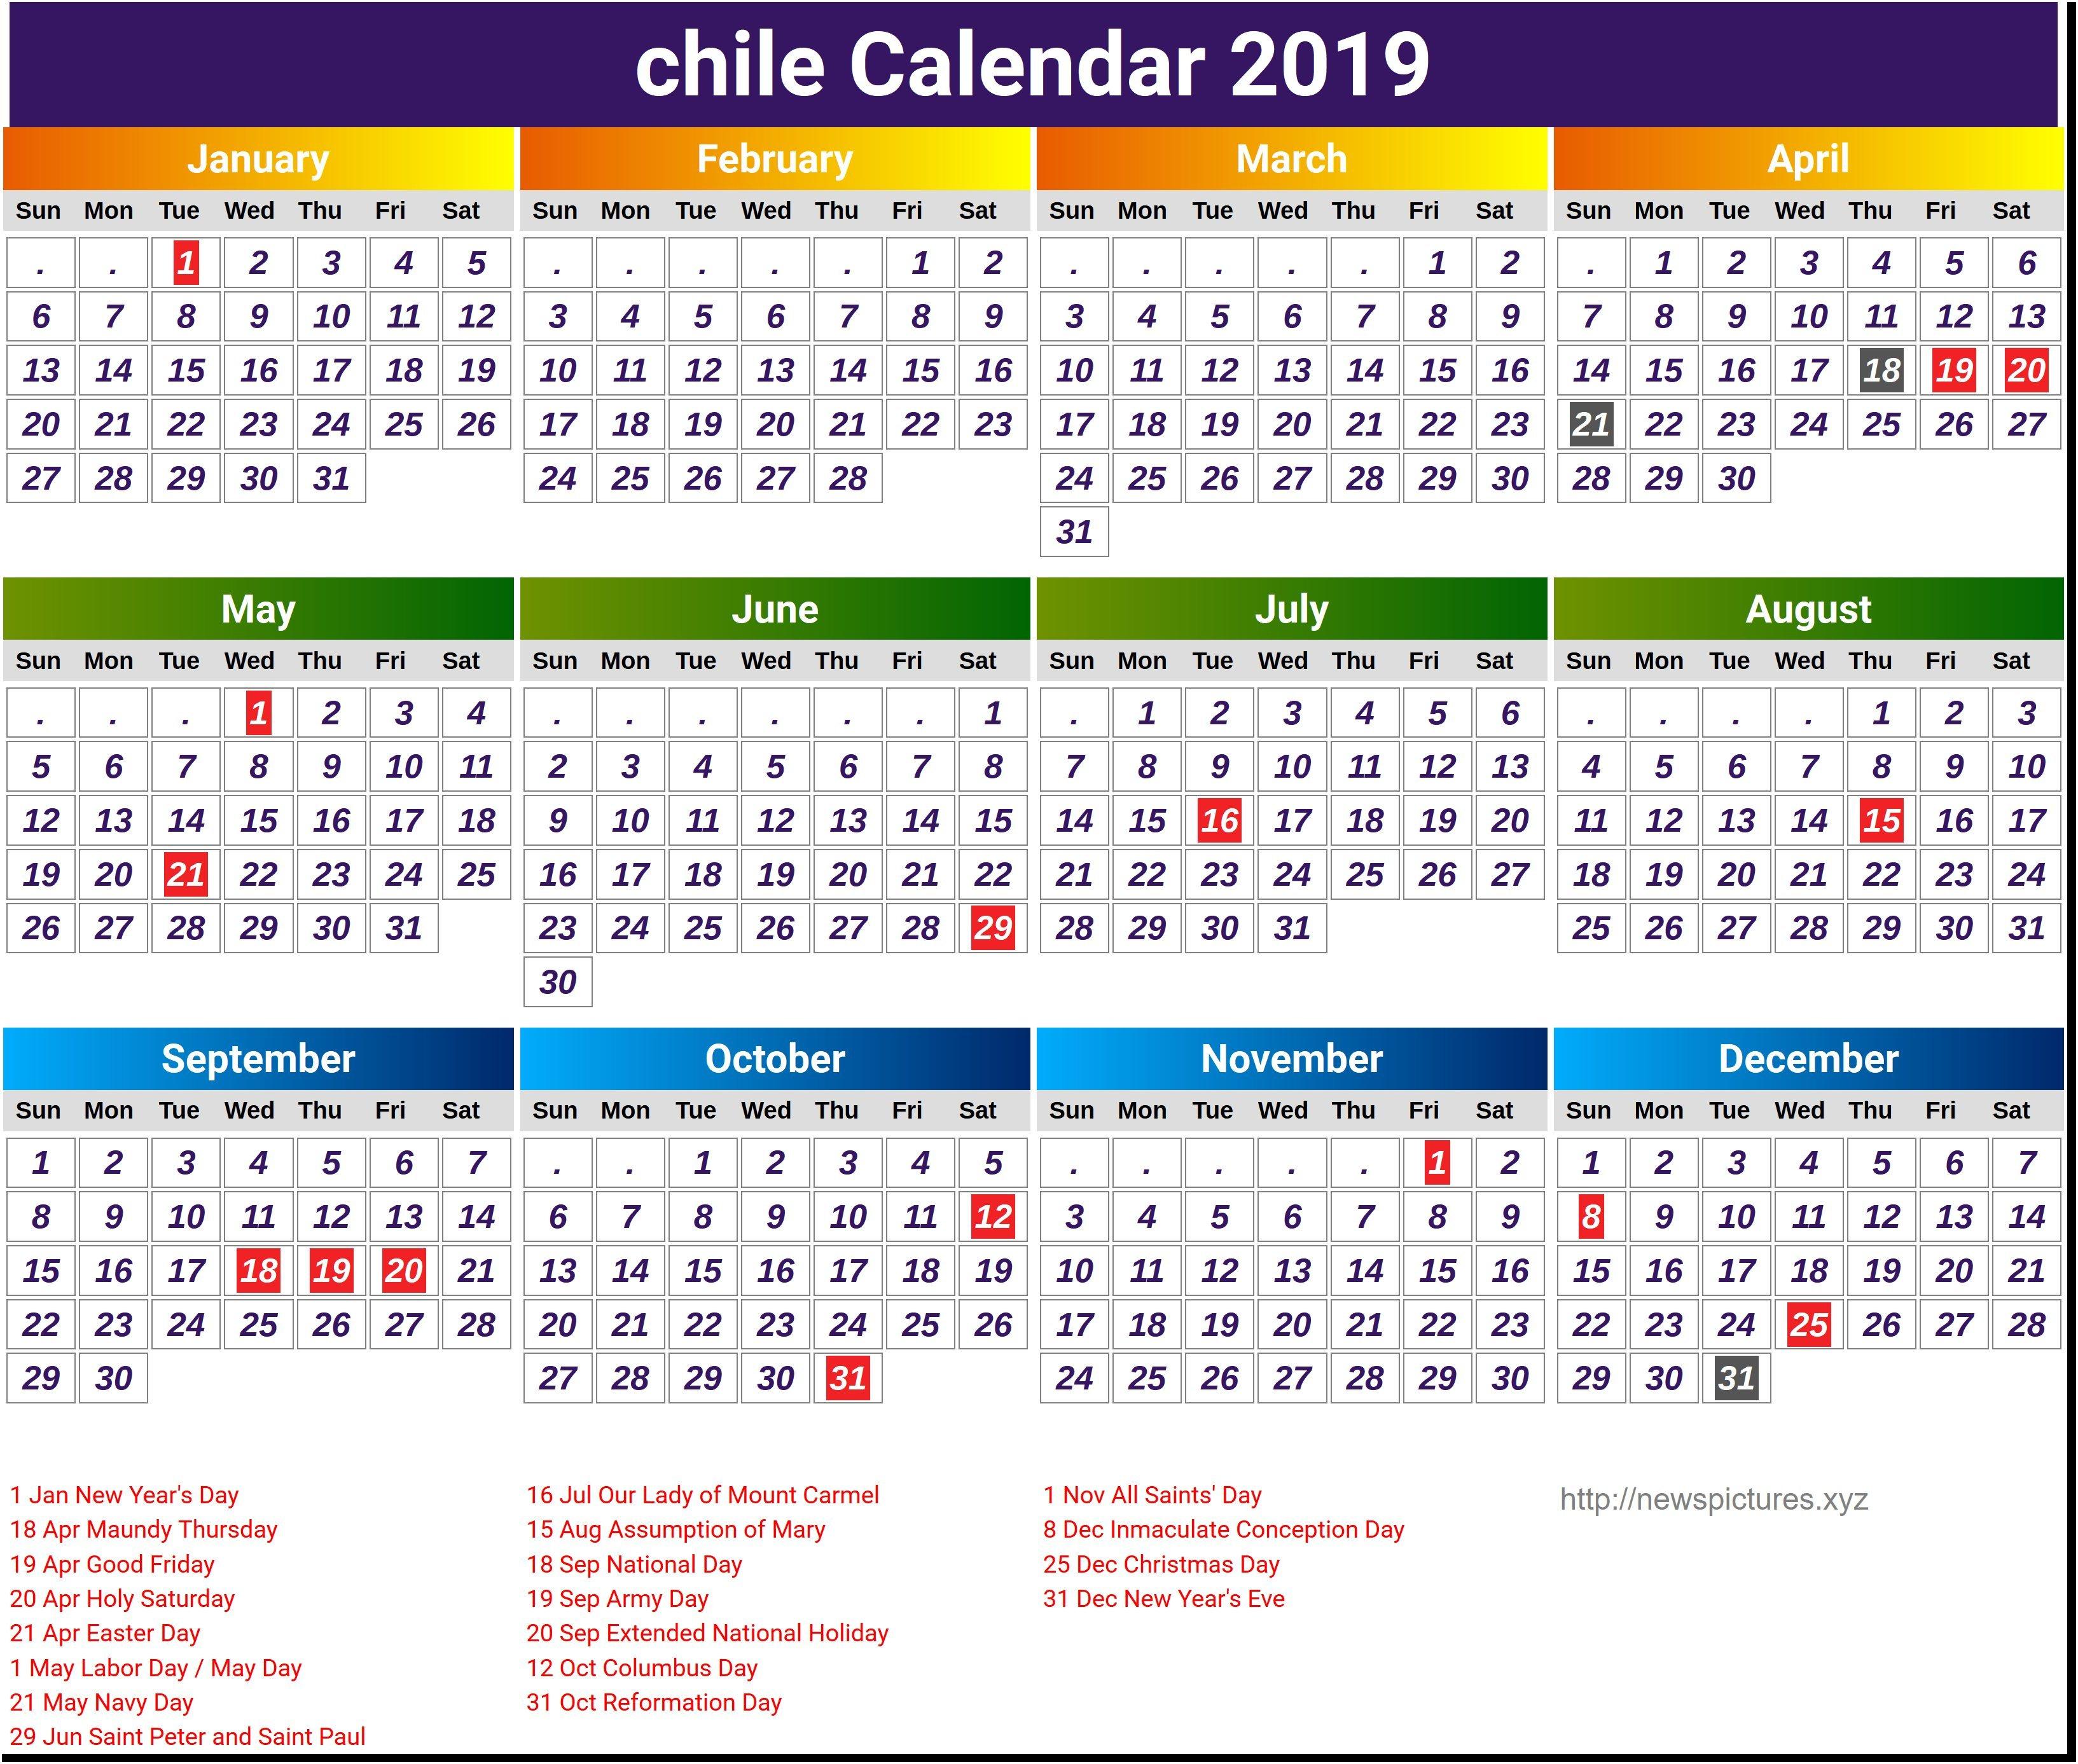 Ucsd Calendar 2019 To Download Or Print | Americanwomanmag Calendar 2019 Ucsd